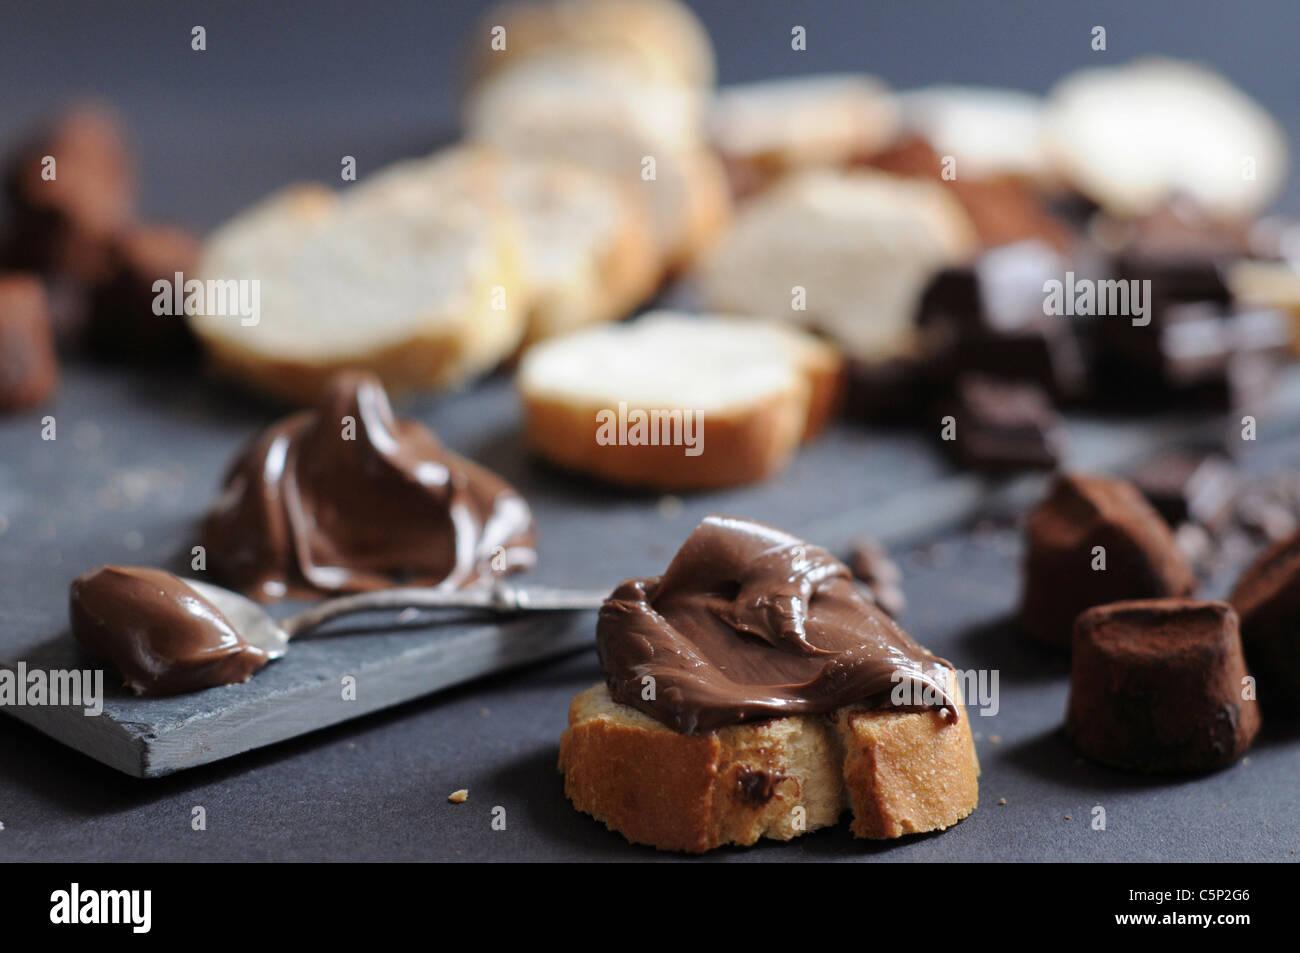 Rebanadas de pan con crema de chocolate, trozos de chocolate y trufas, polvo cokoa Imagen De Stock